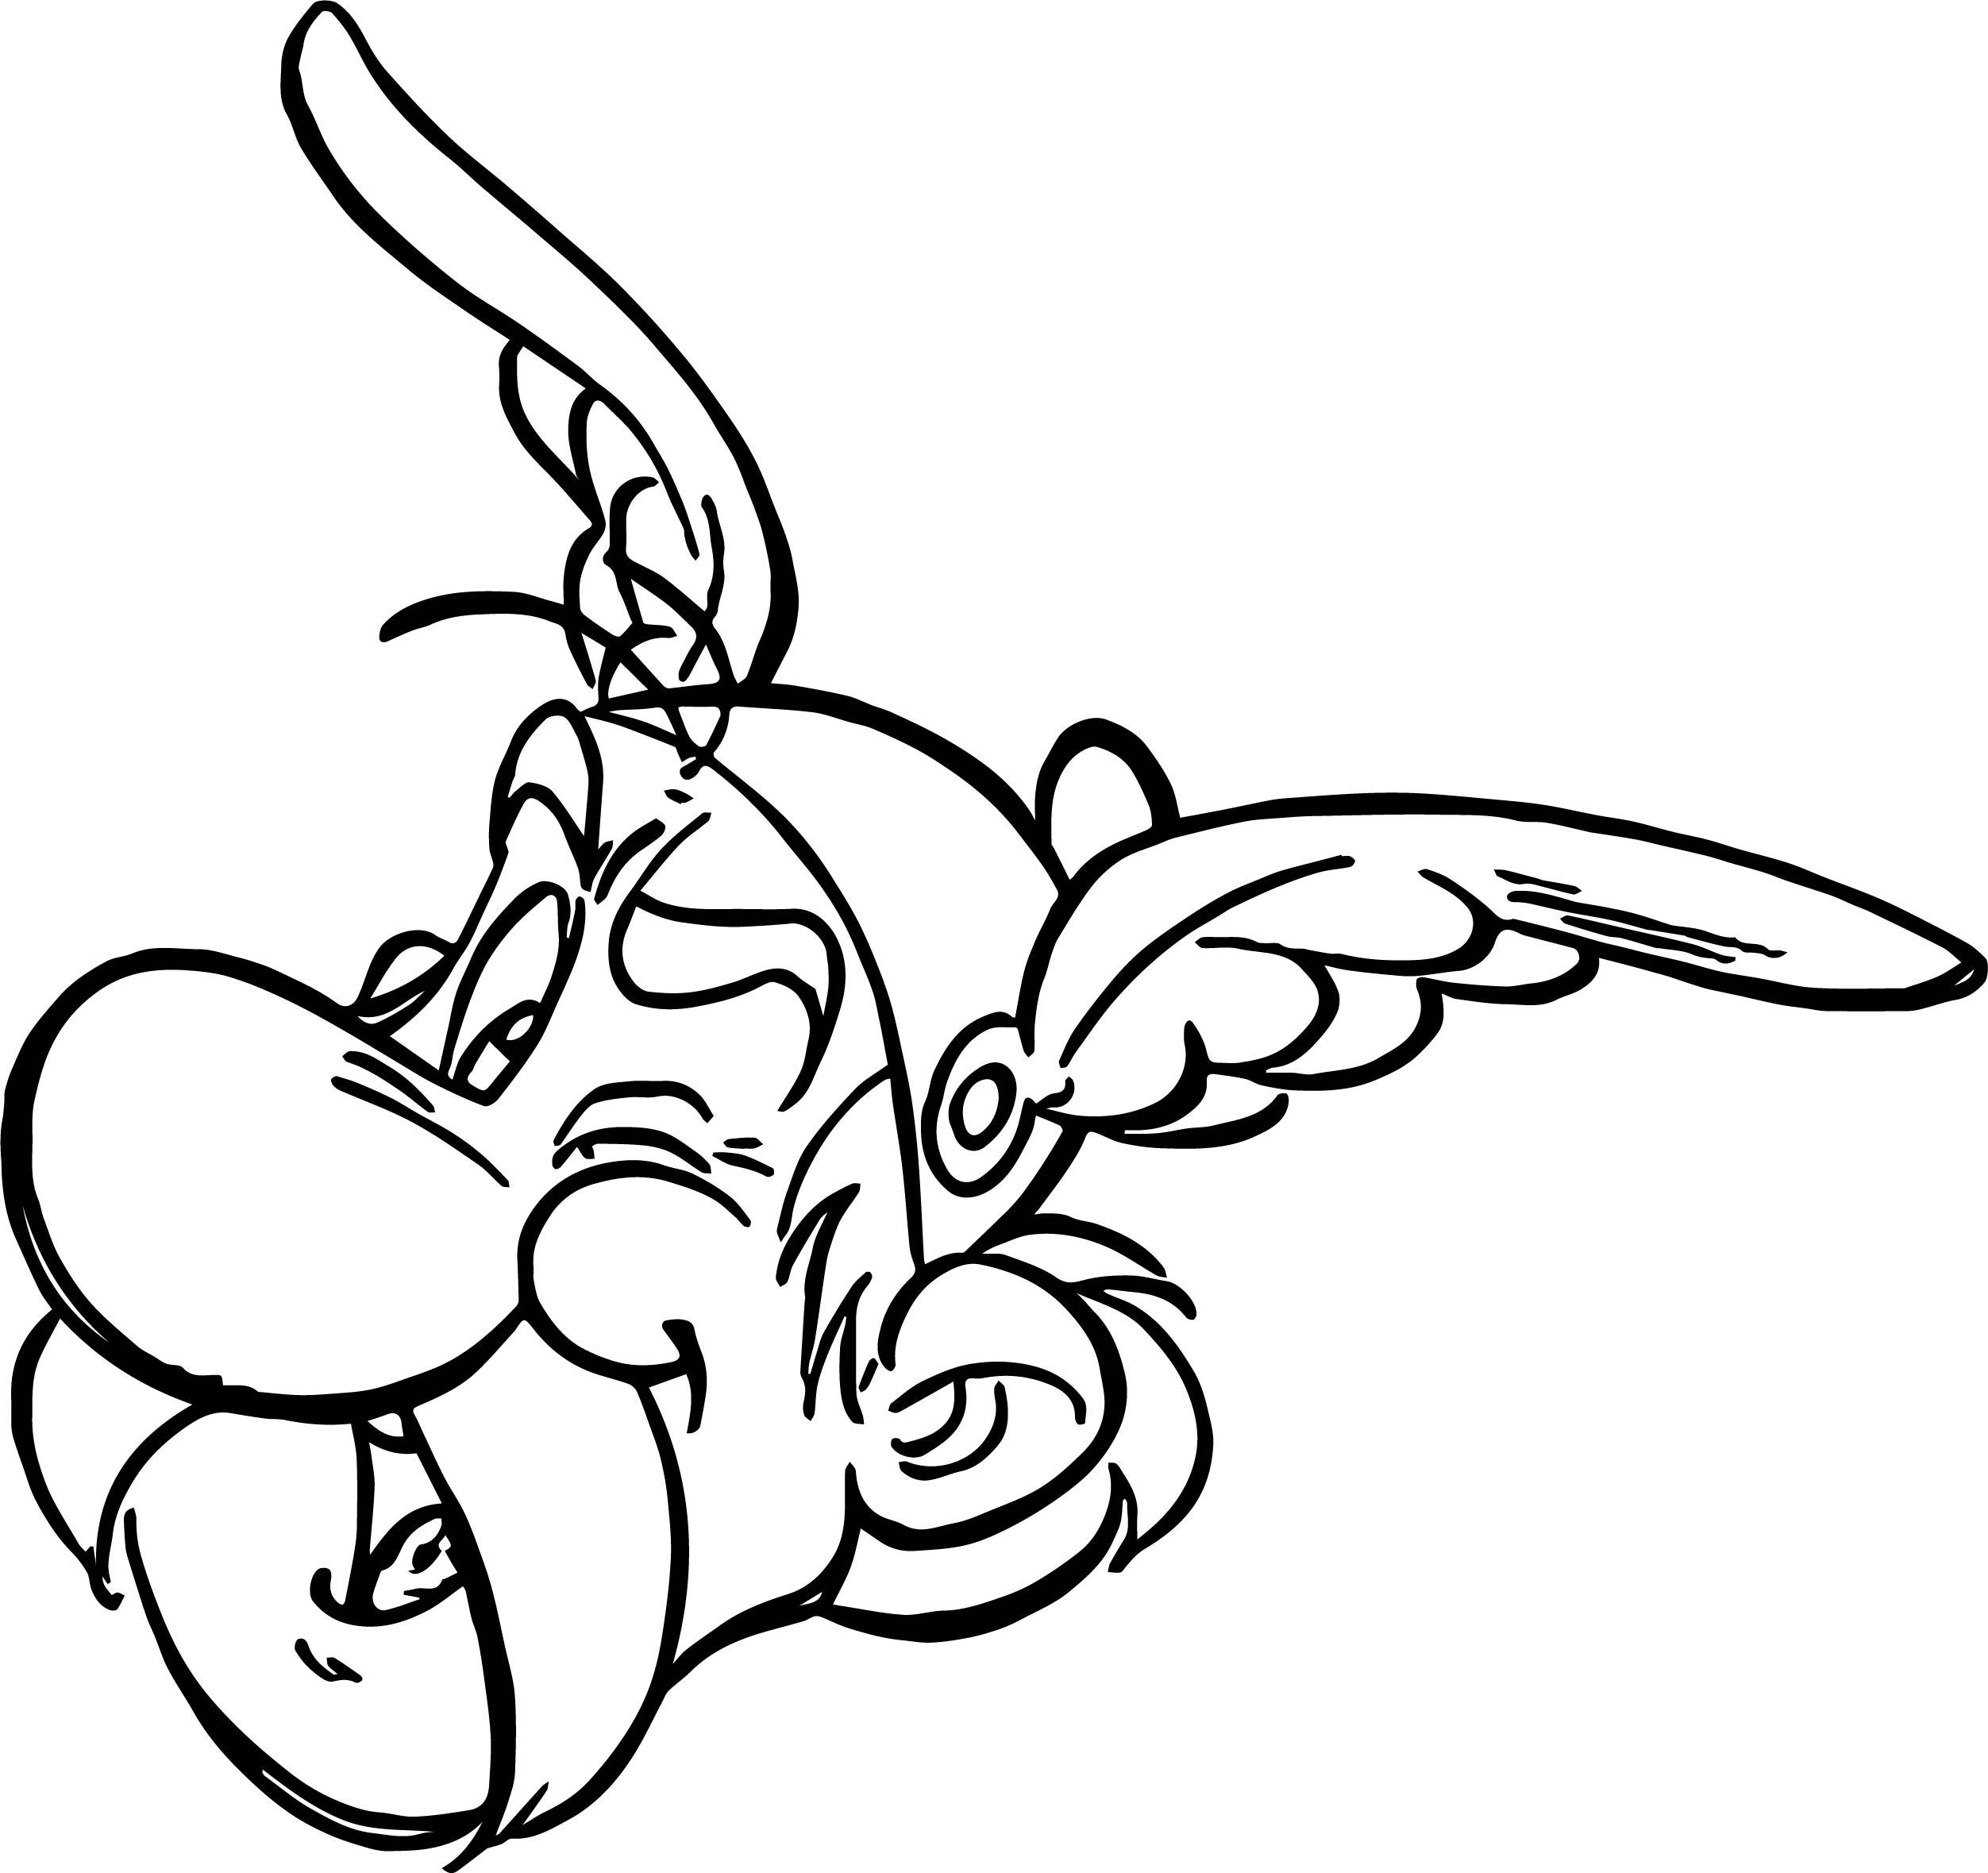 Asterix Head Coloring Page